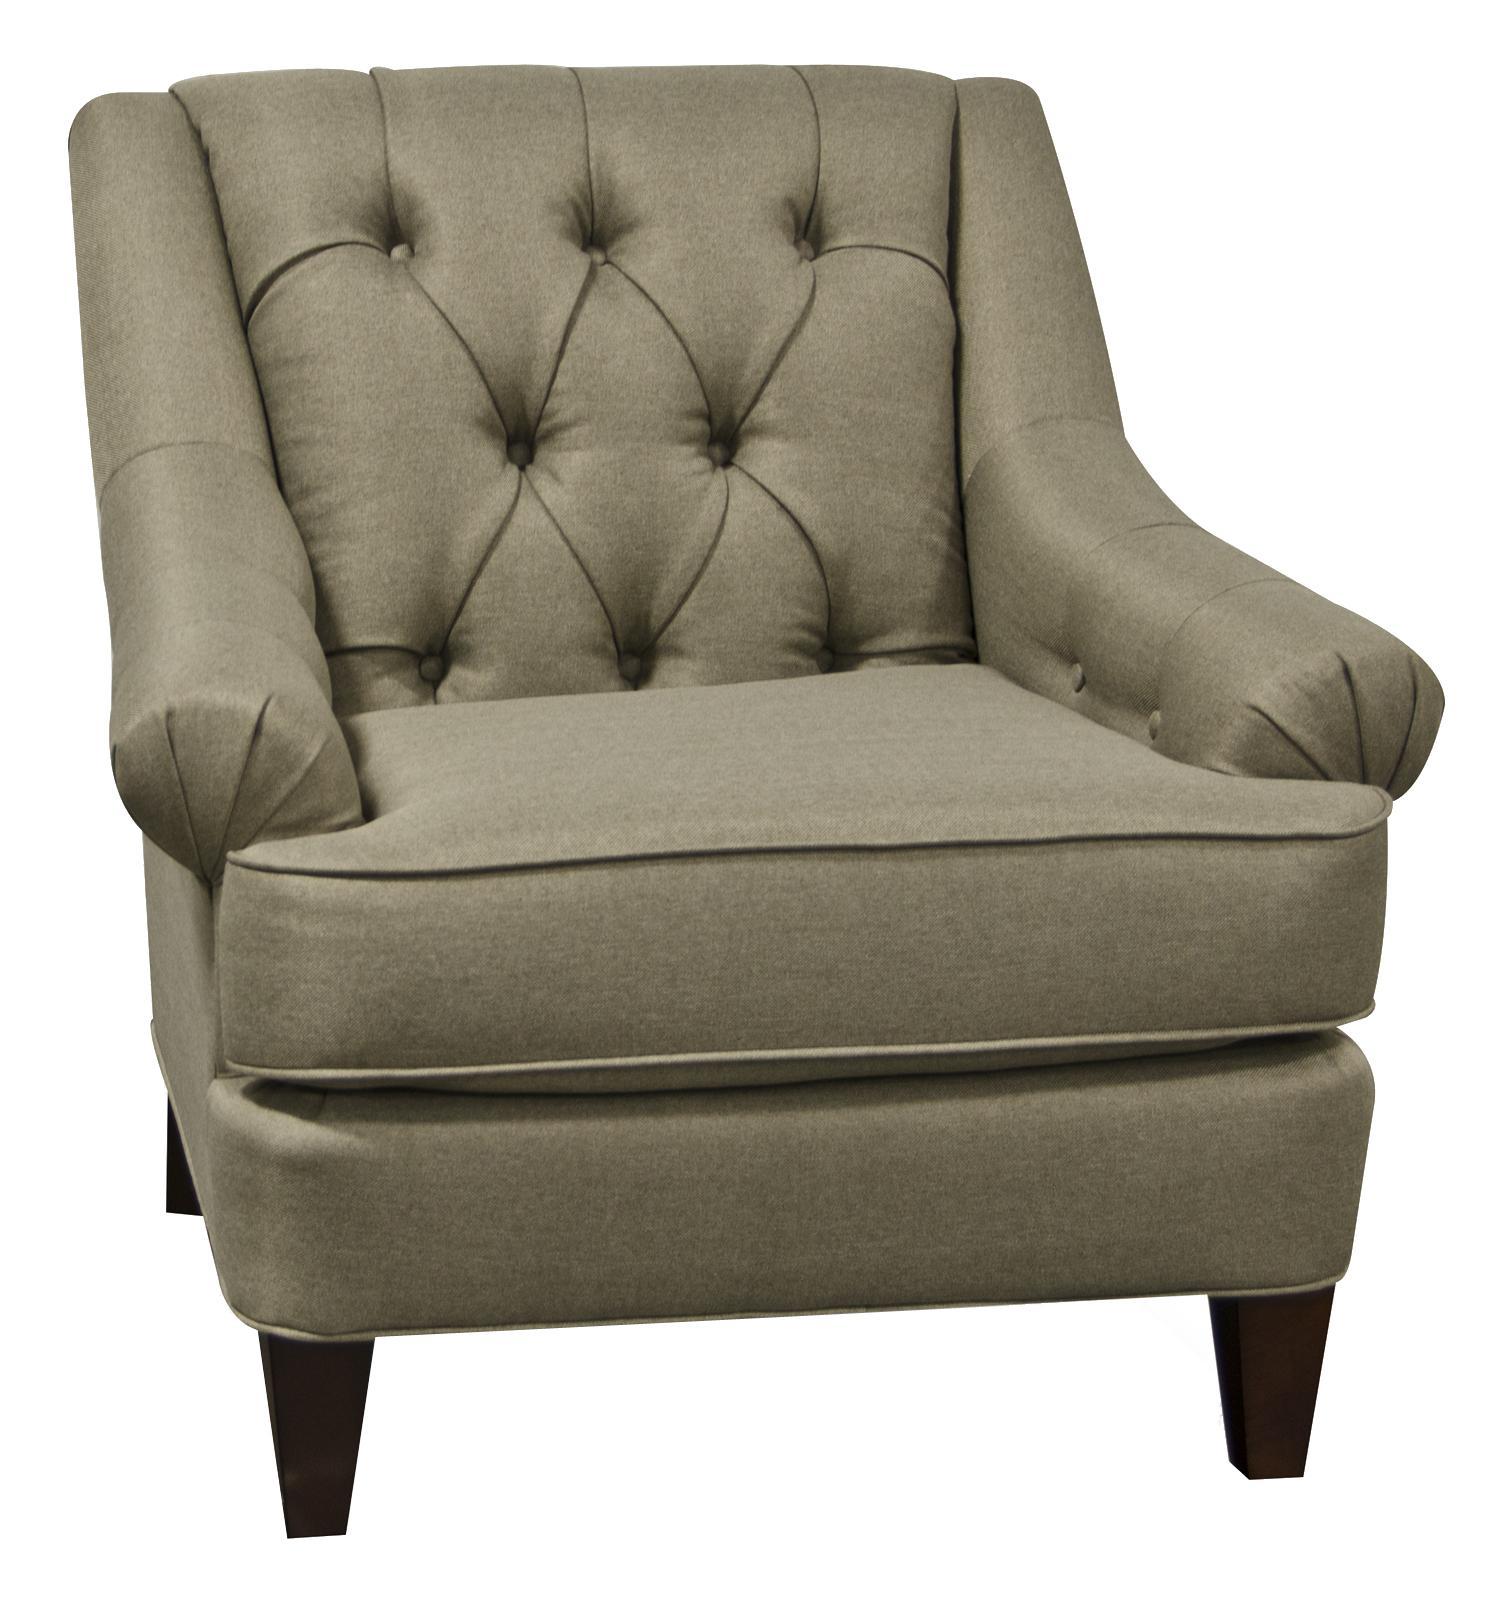 England Nash Chair - Item Number: 4434-5281